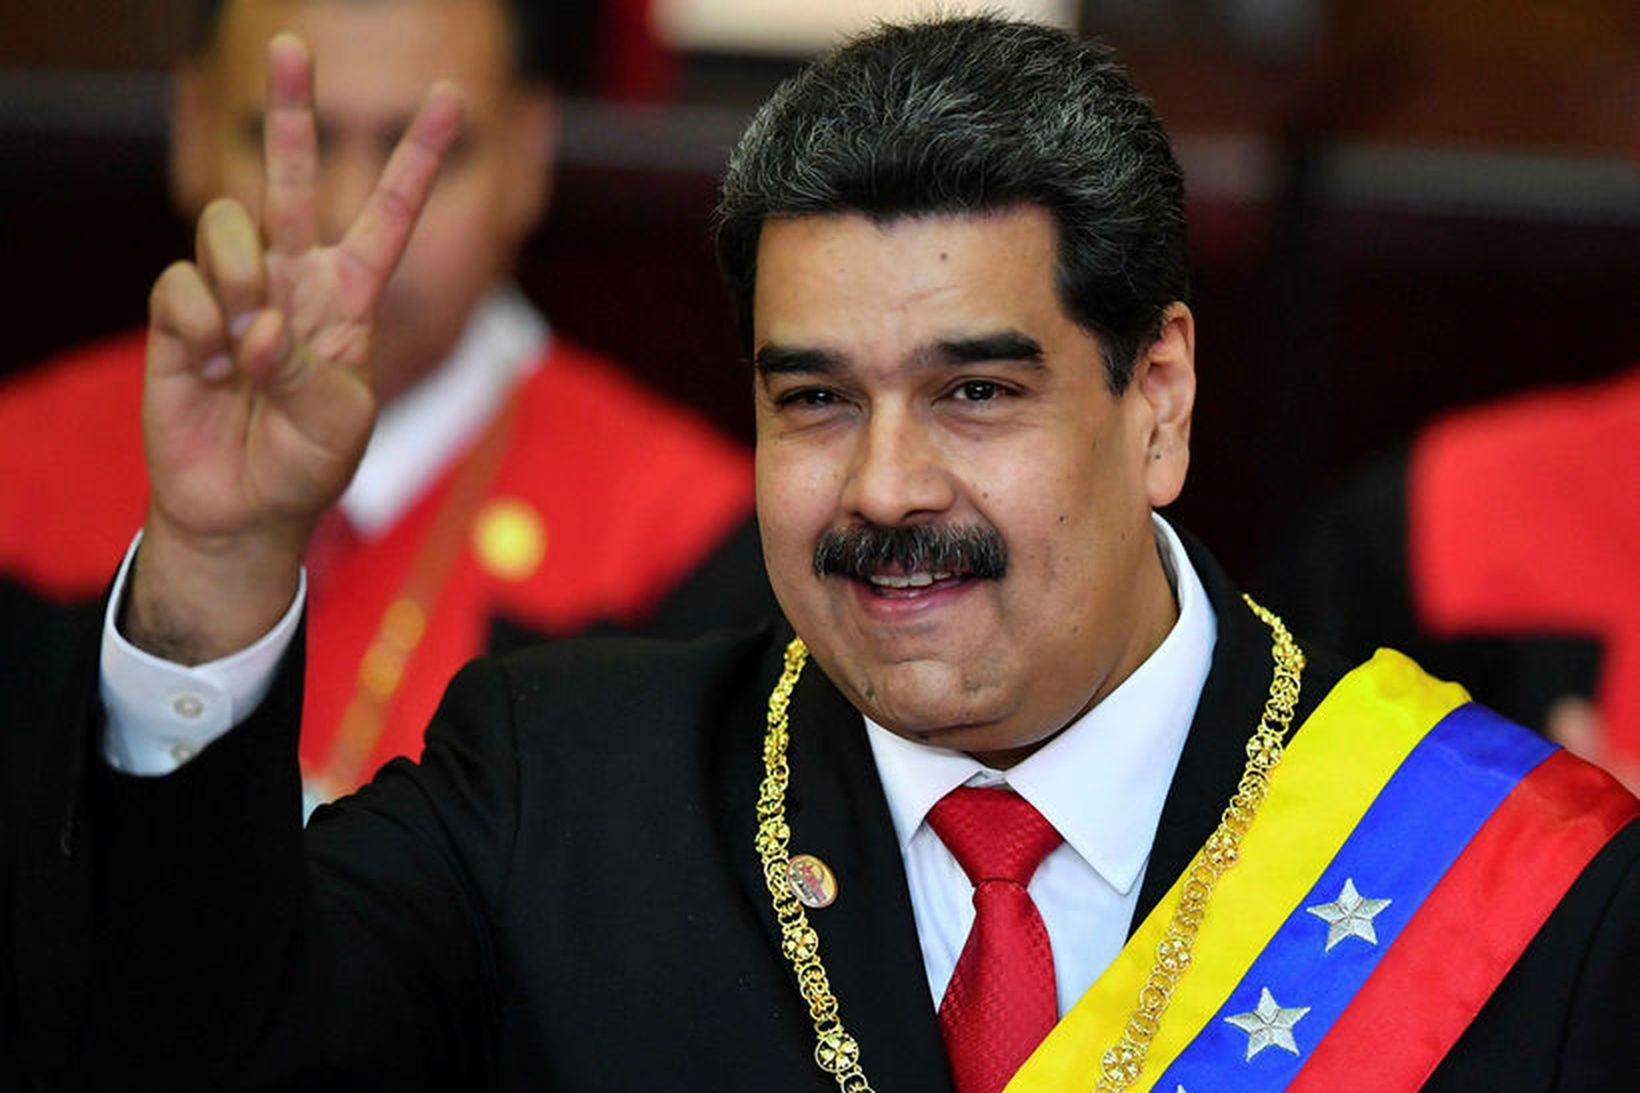 Nicolas Maduro, forseti Venesúela, segir Ku Klux Klan stjórna í …